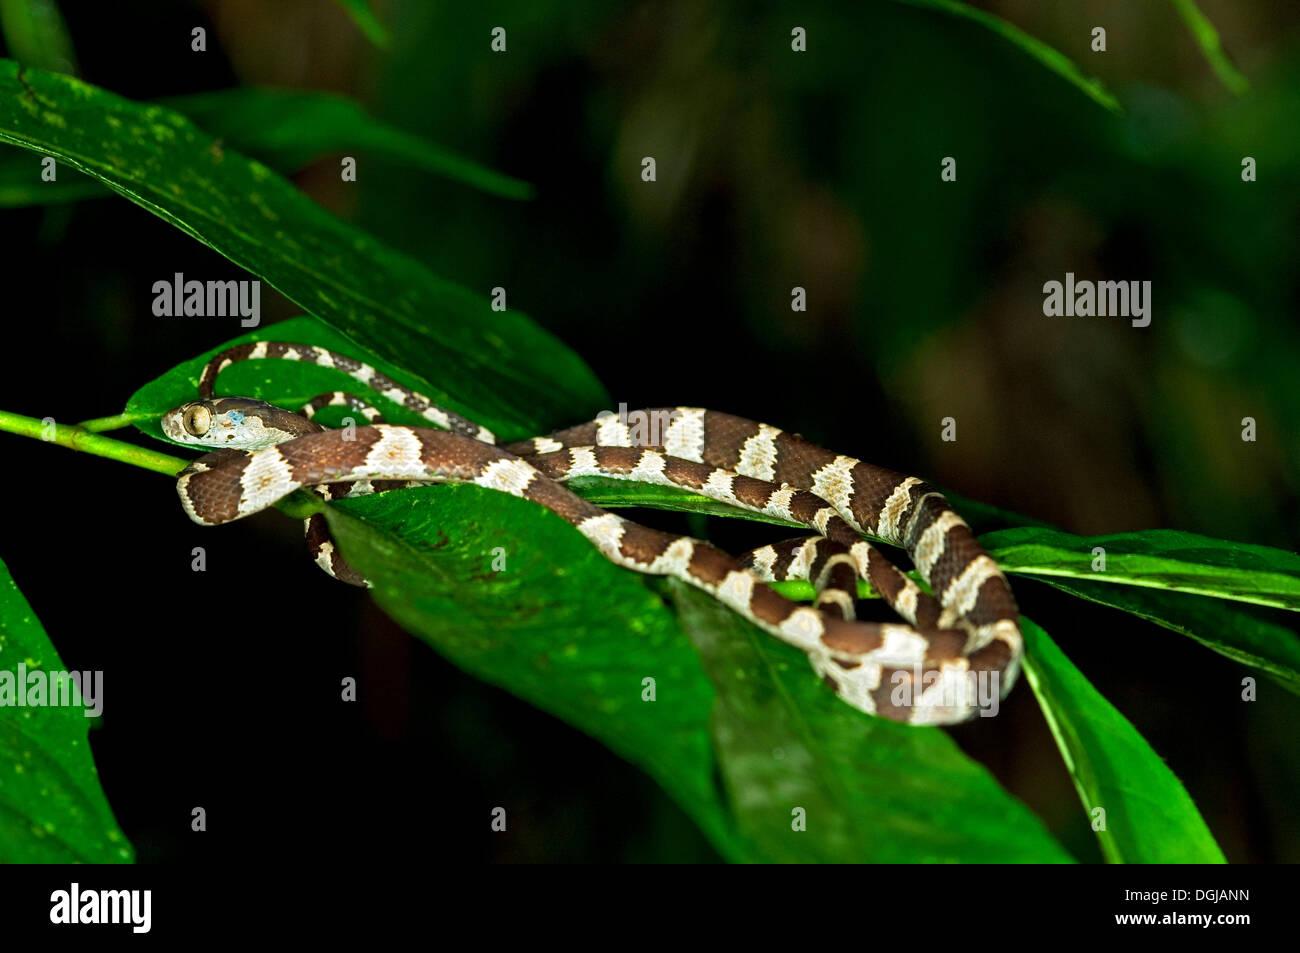 Amazon Basin Tree Snake (Imantodes lentiferus) on leaves, Tambopata Nature Reserve, Madre de Dios Region, Peru - Stock Image